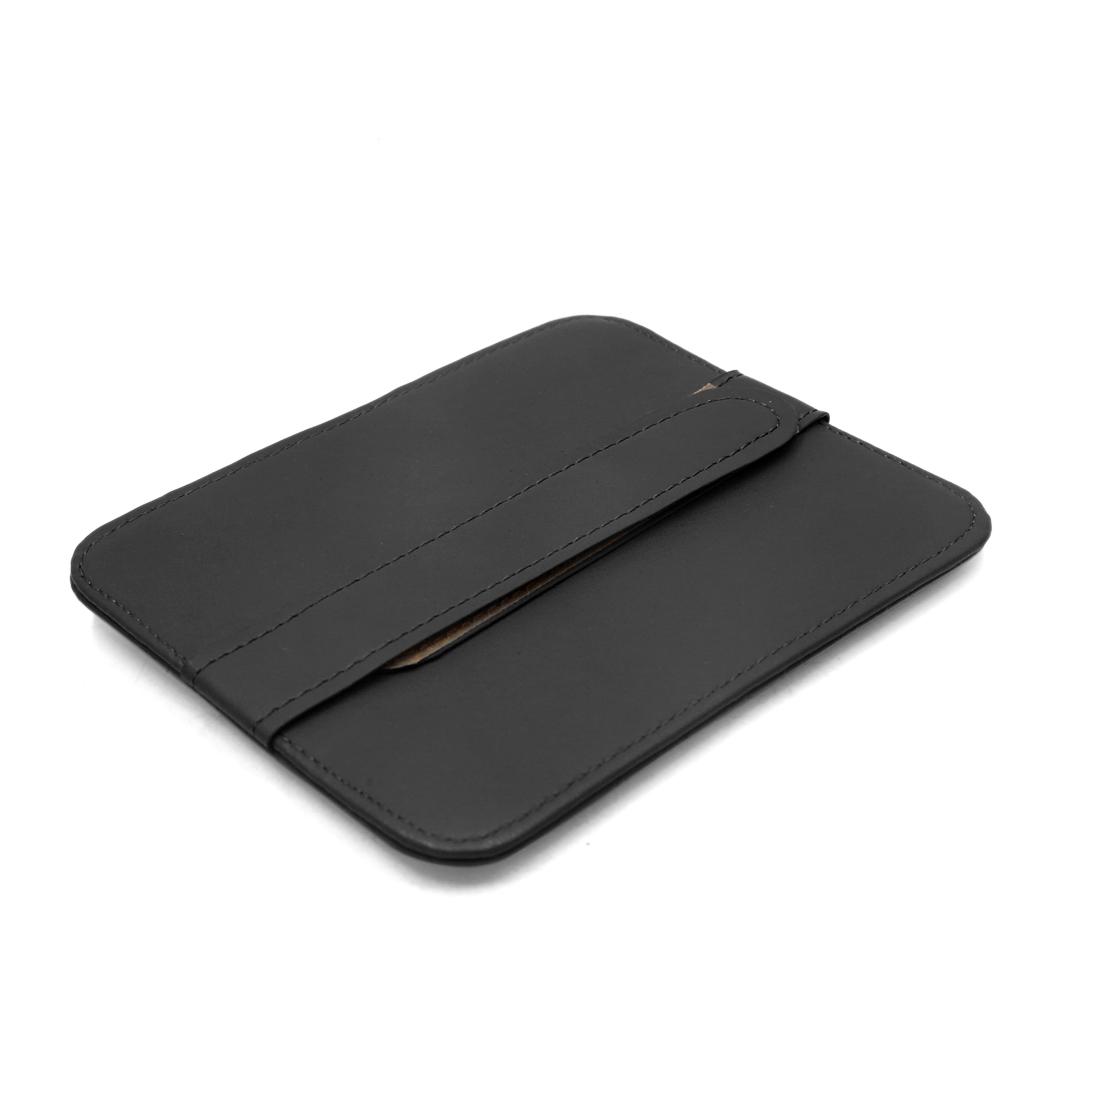 Black Faux Leather Car Sun Visor Card Glasses Storage Holder Pouch Bag Organizer - image 1 de 4